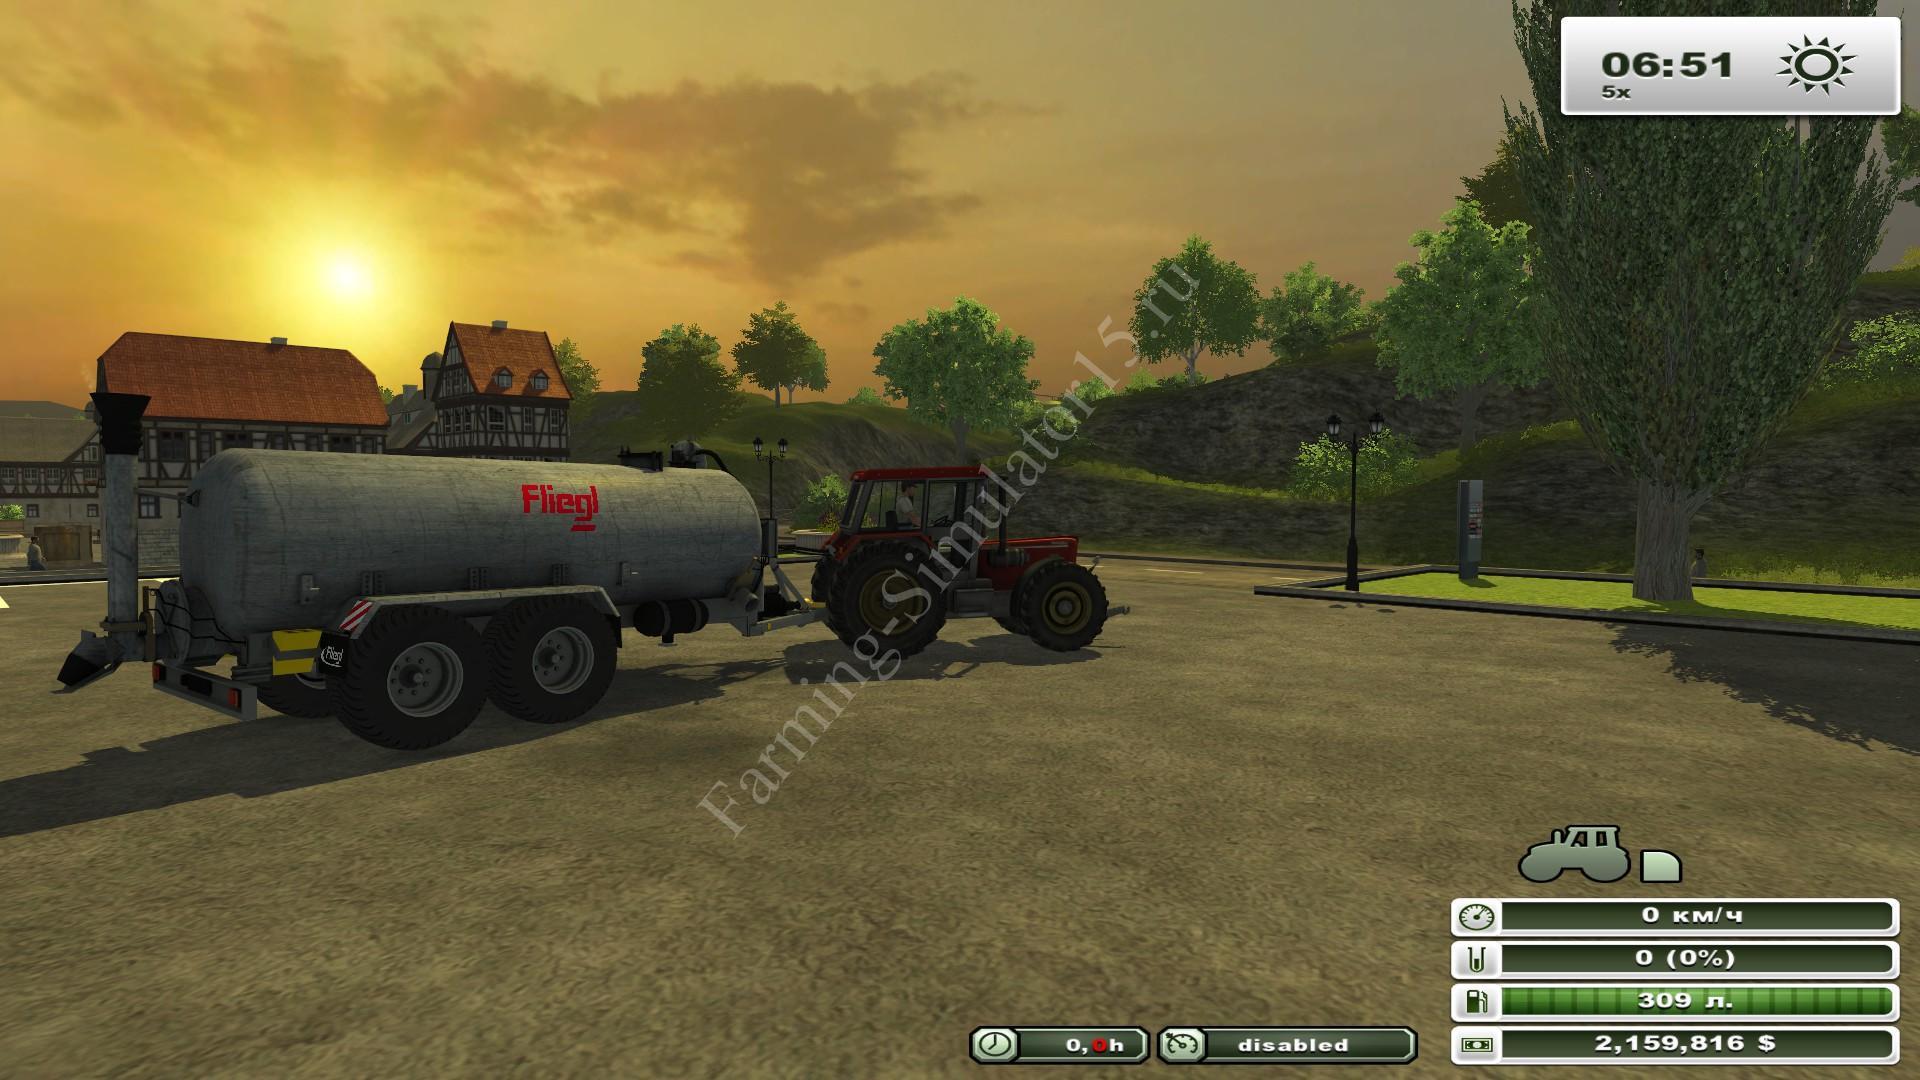 FLIEGL VFW 18000 v 1.0 - мод прицеп для навоза Farming Simulator 13